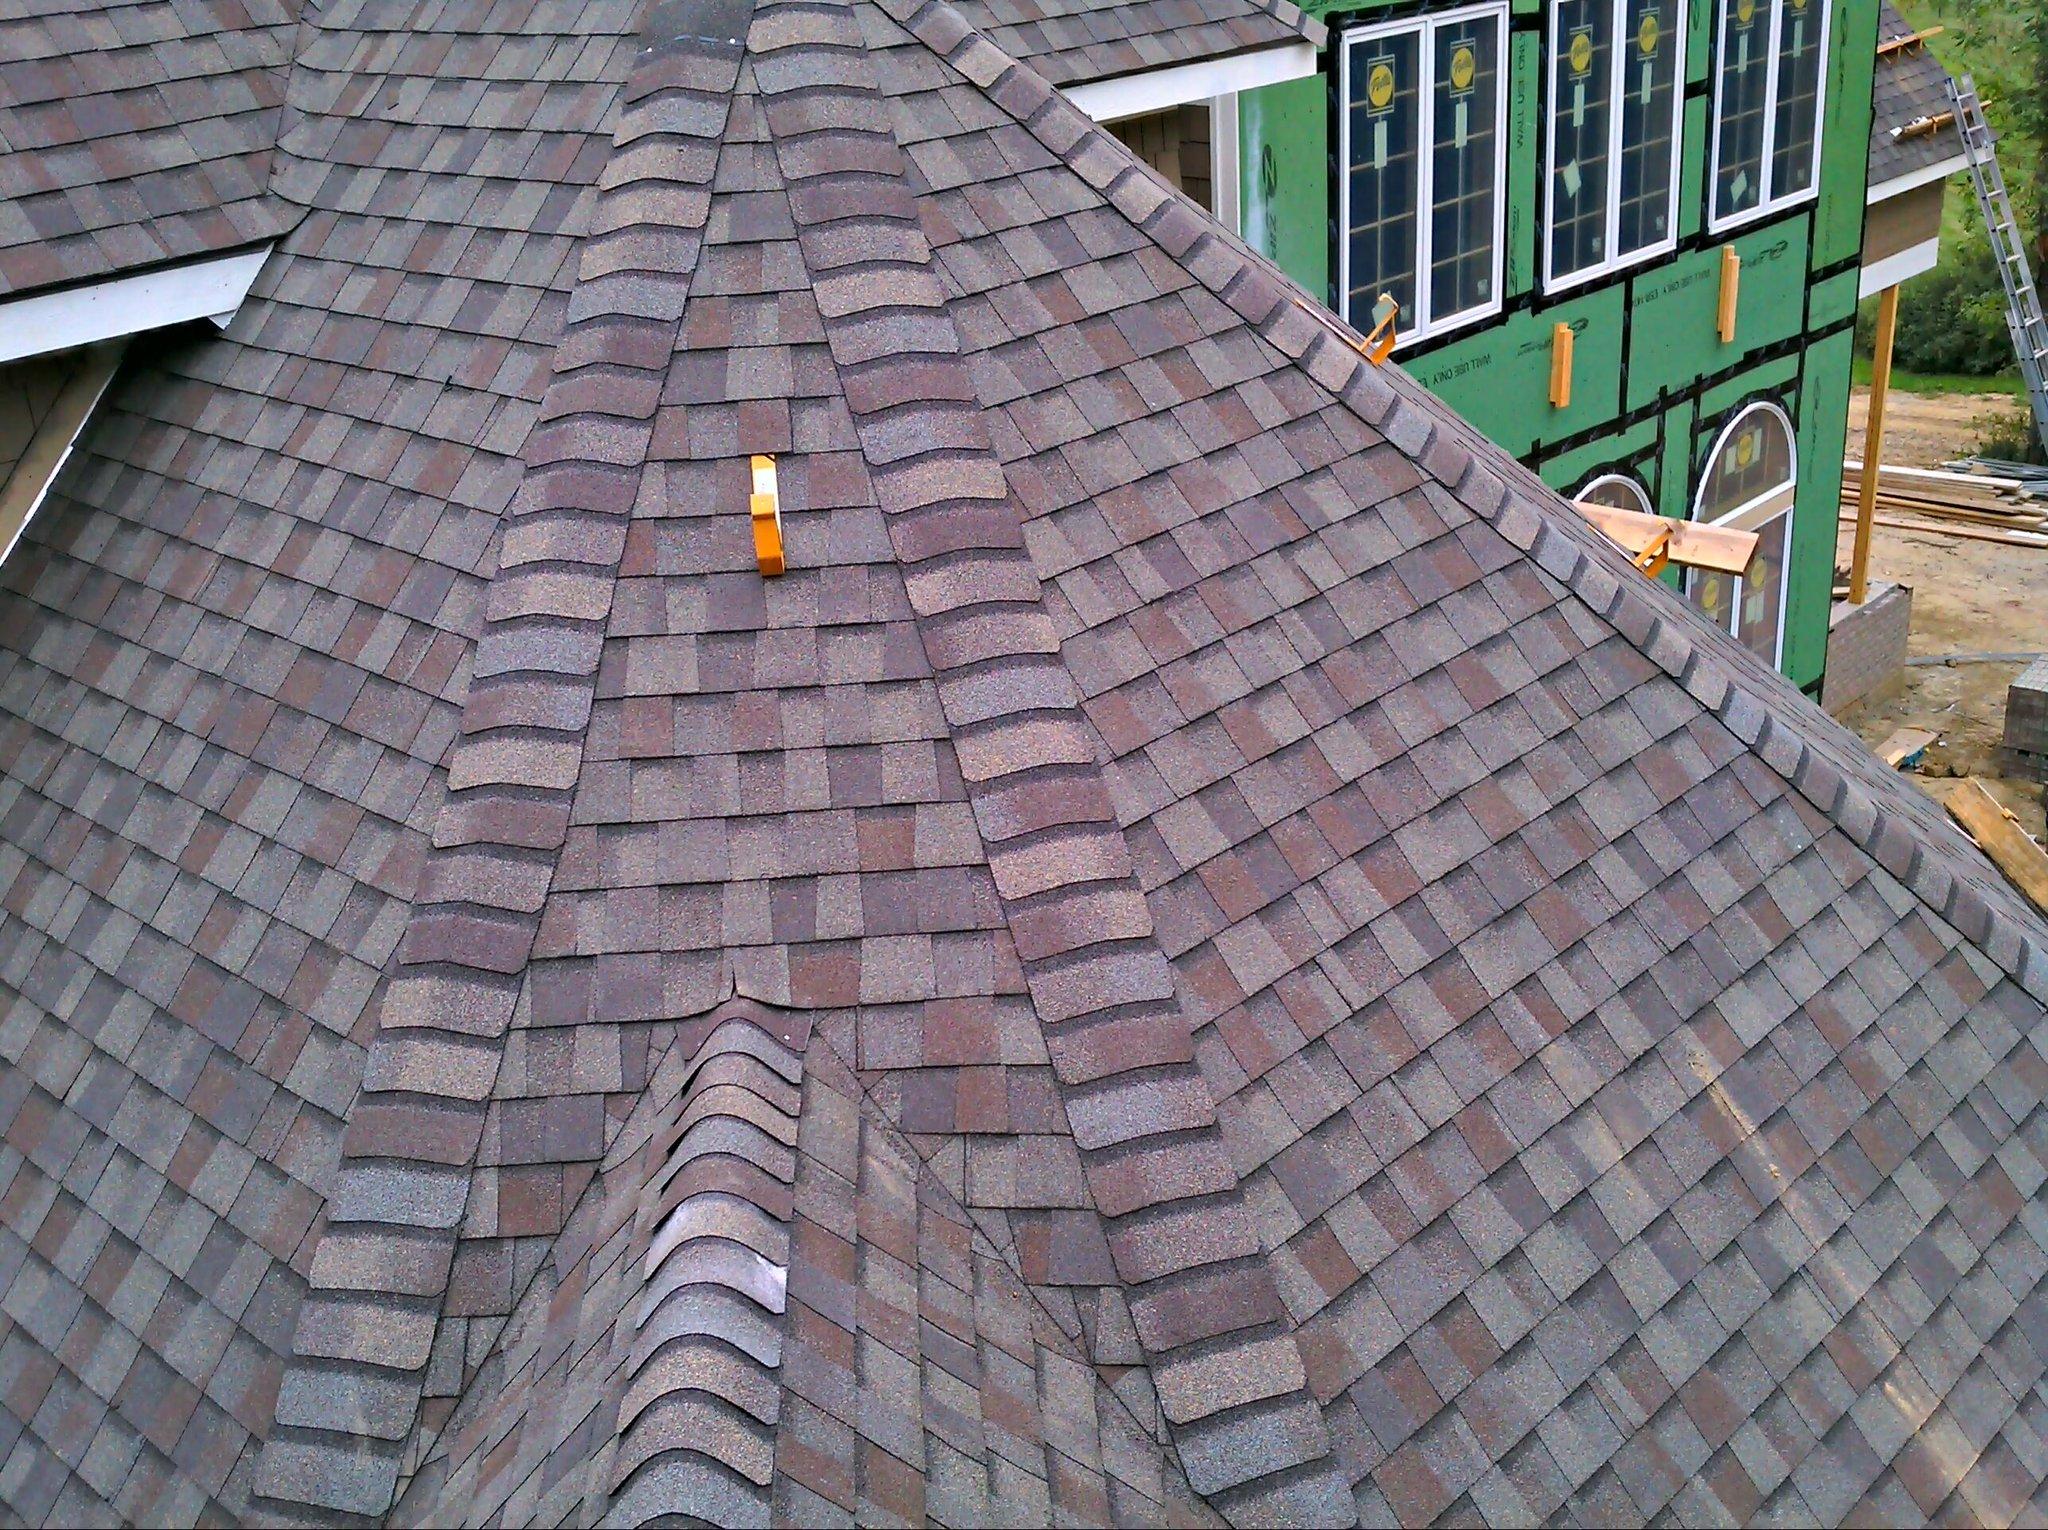 On the roof. Installing CertainTeed Landmark Weathered Wood shingles. Looks like it may rain. http://t.co/El2mdHmS